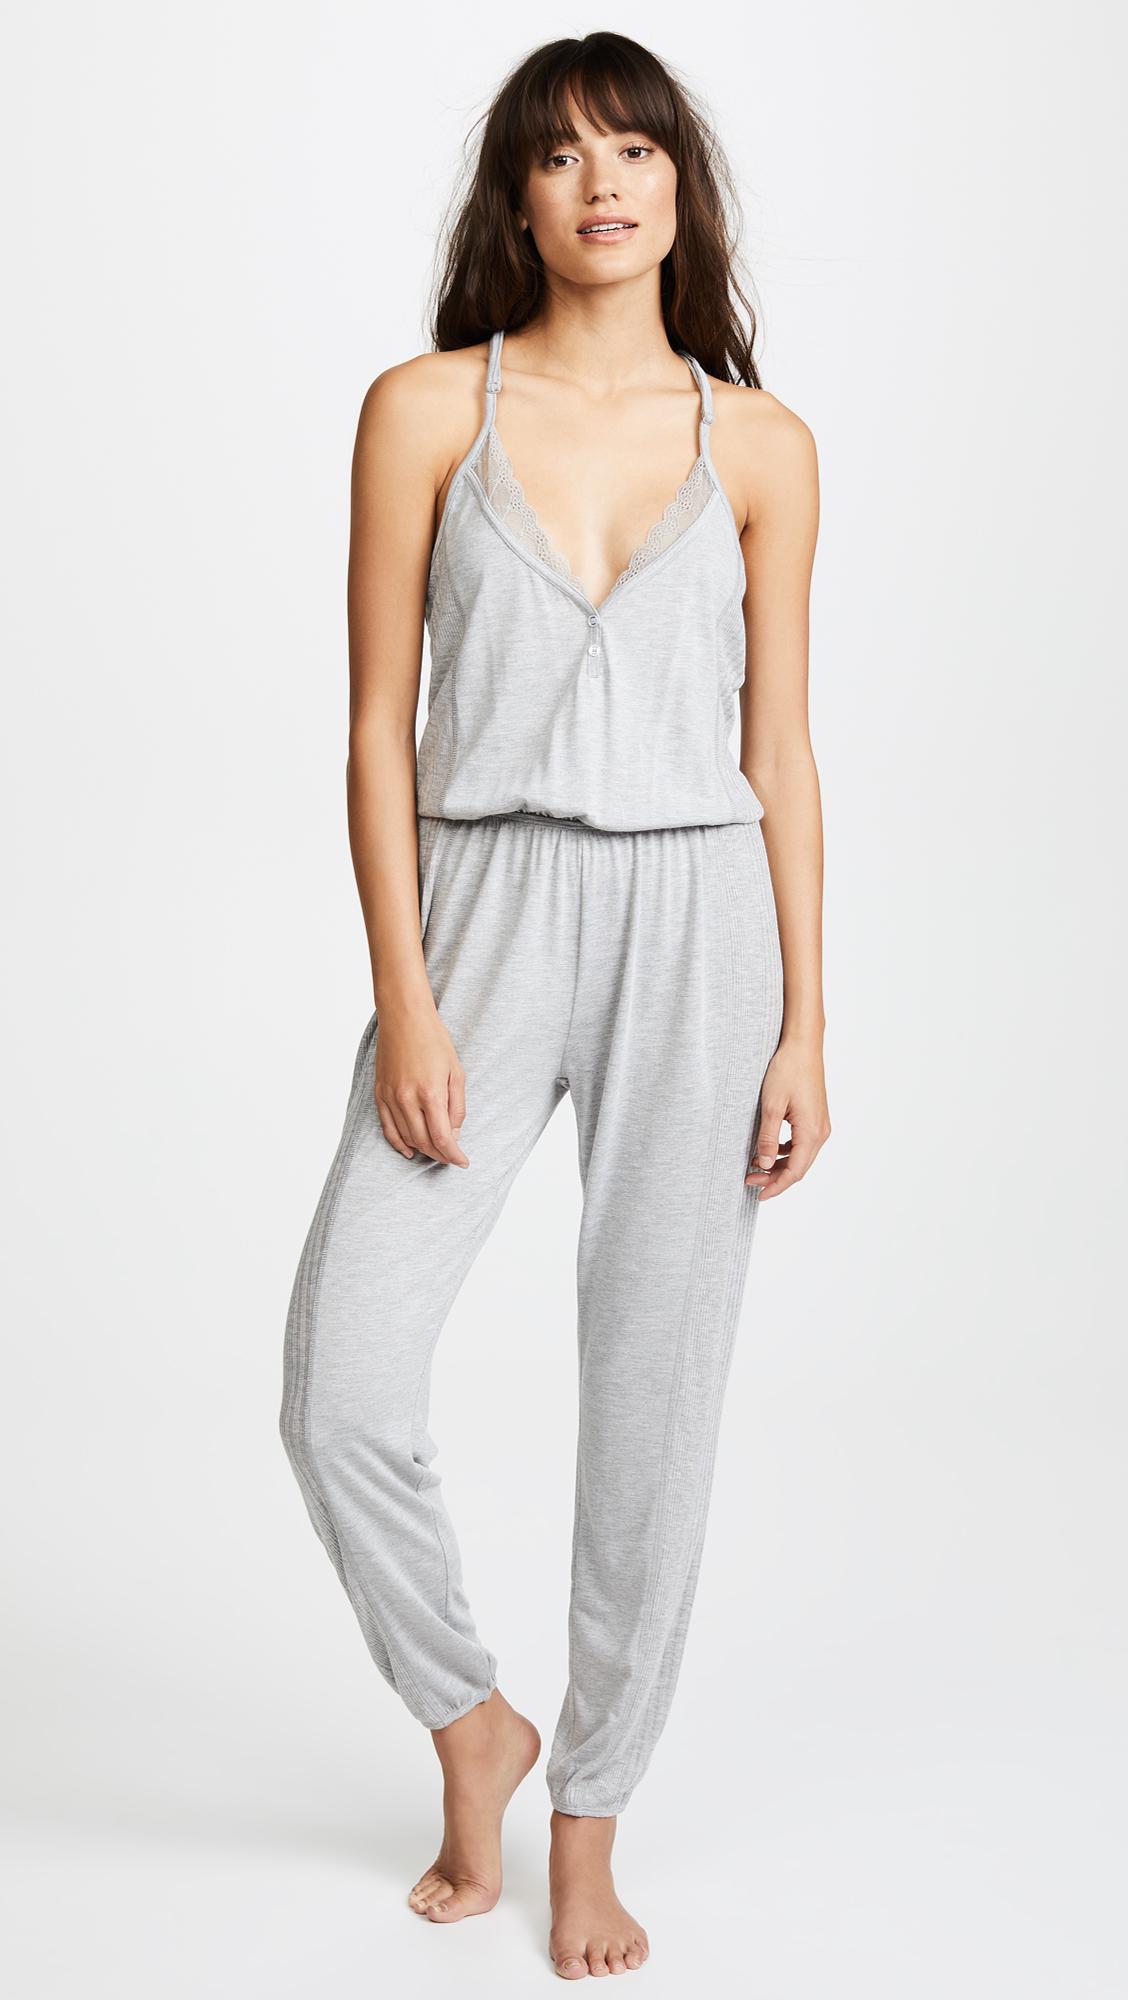 da24b0556fc Lyst - Splendid Always Sleep Jumpsuit in Gray